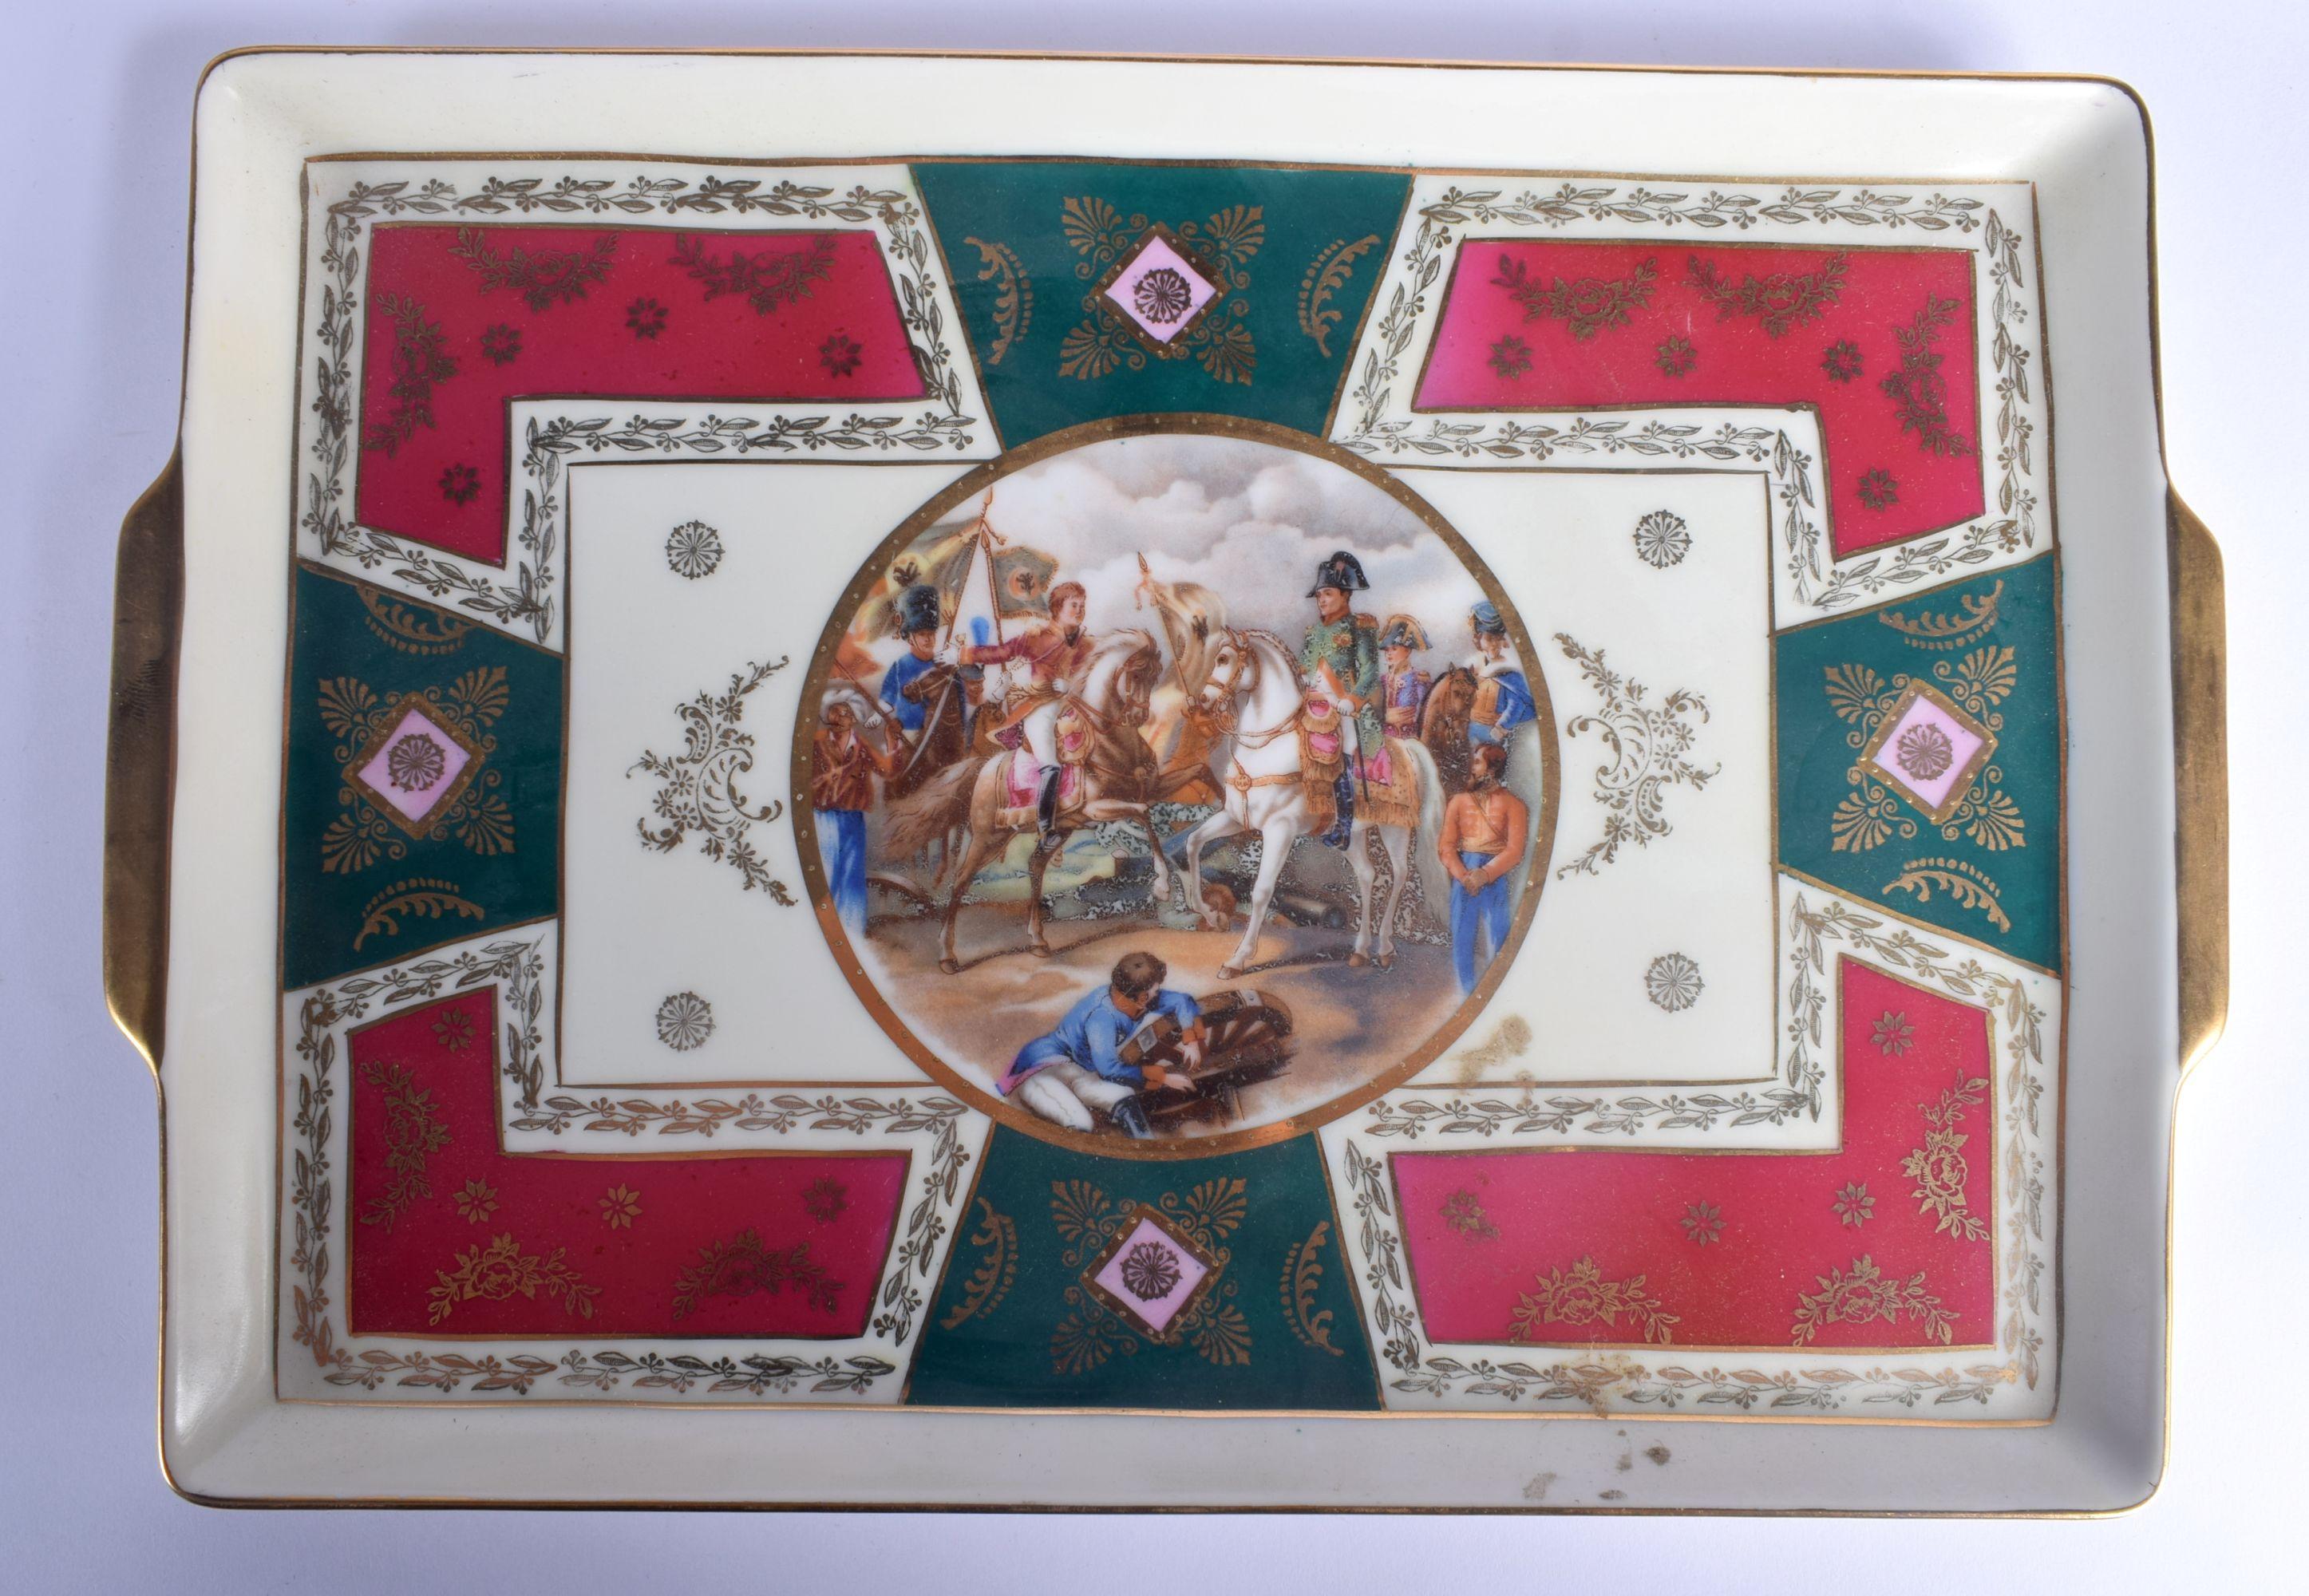 A VINTAGE J K CARLSBAD BAVARIA PORCELAIN VIENNA STYLE TEASET decorated with Napoleonic scenes. Large - Image 6 of 22